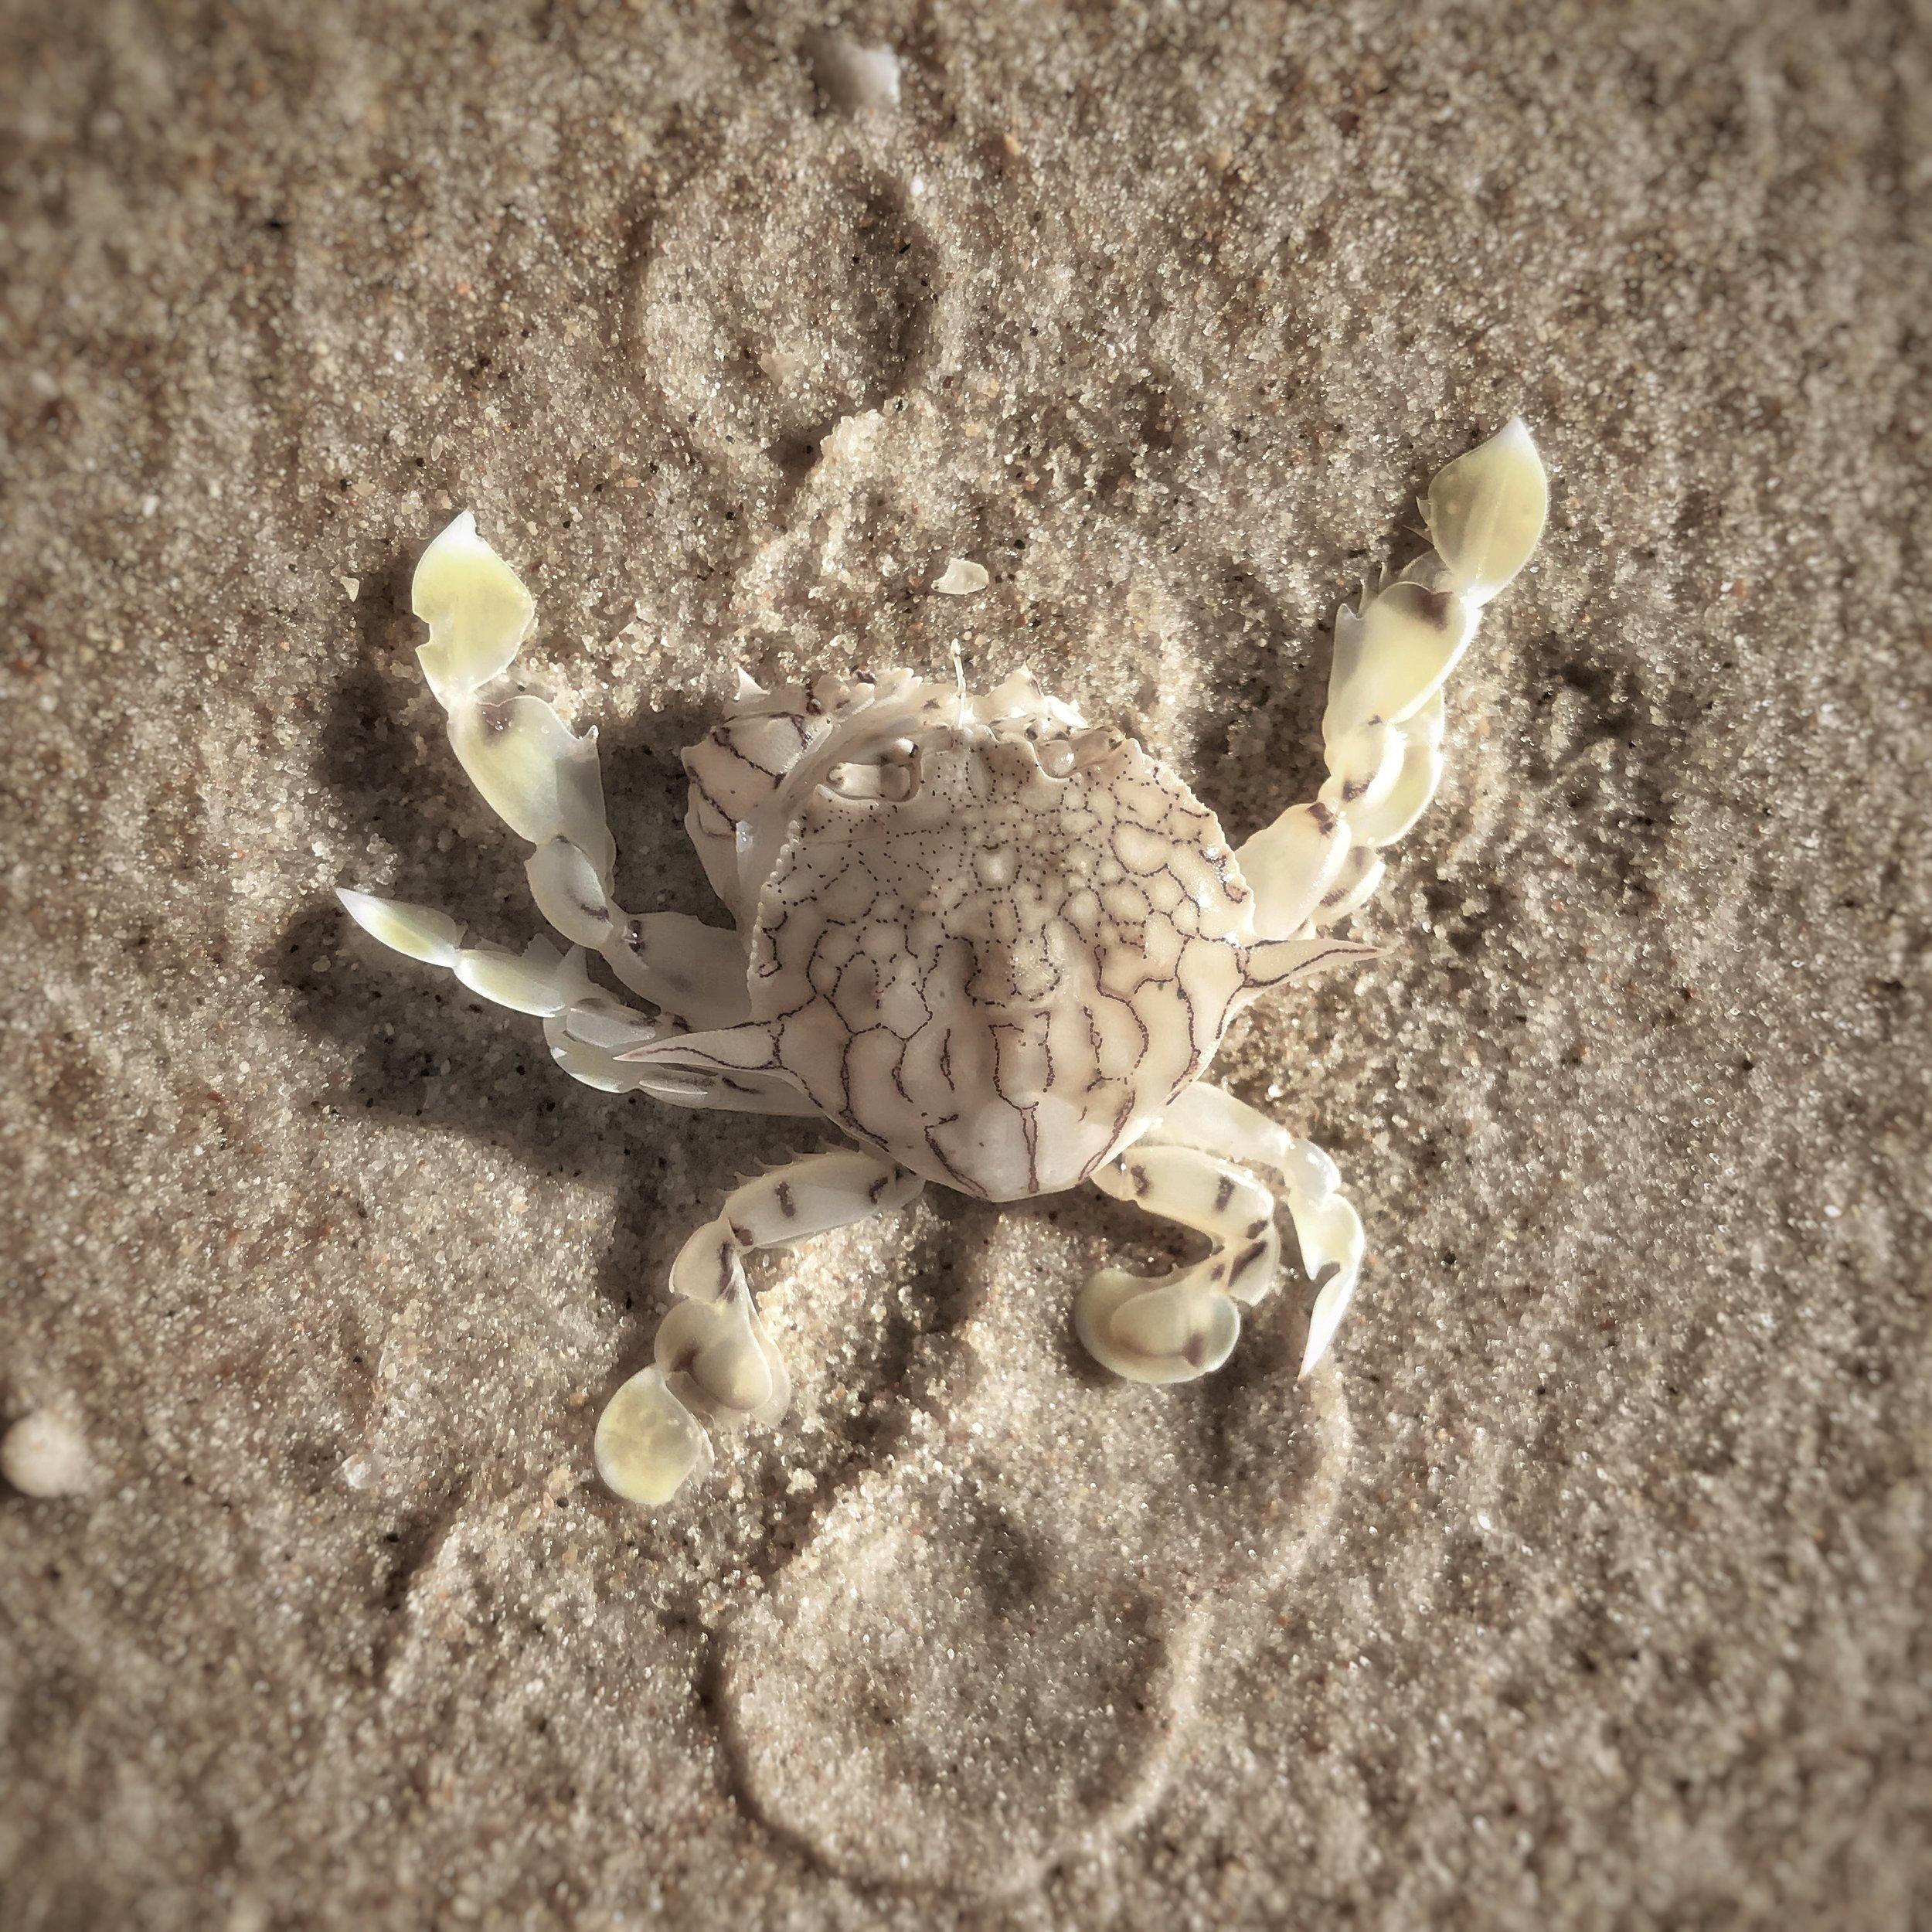 Porcelain on Sand